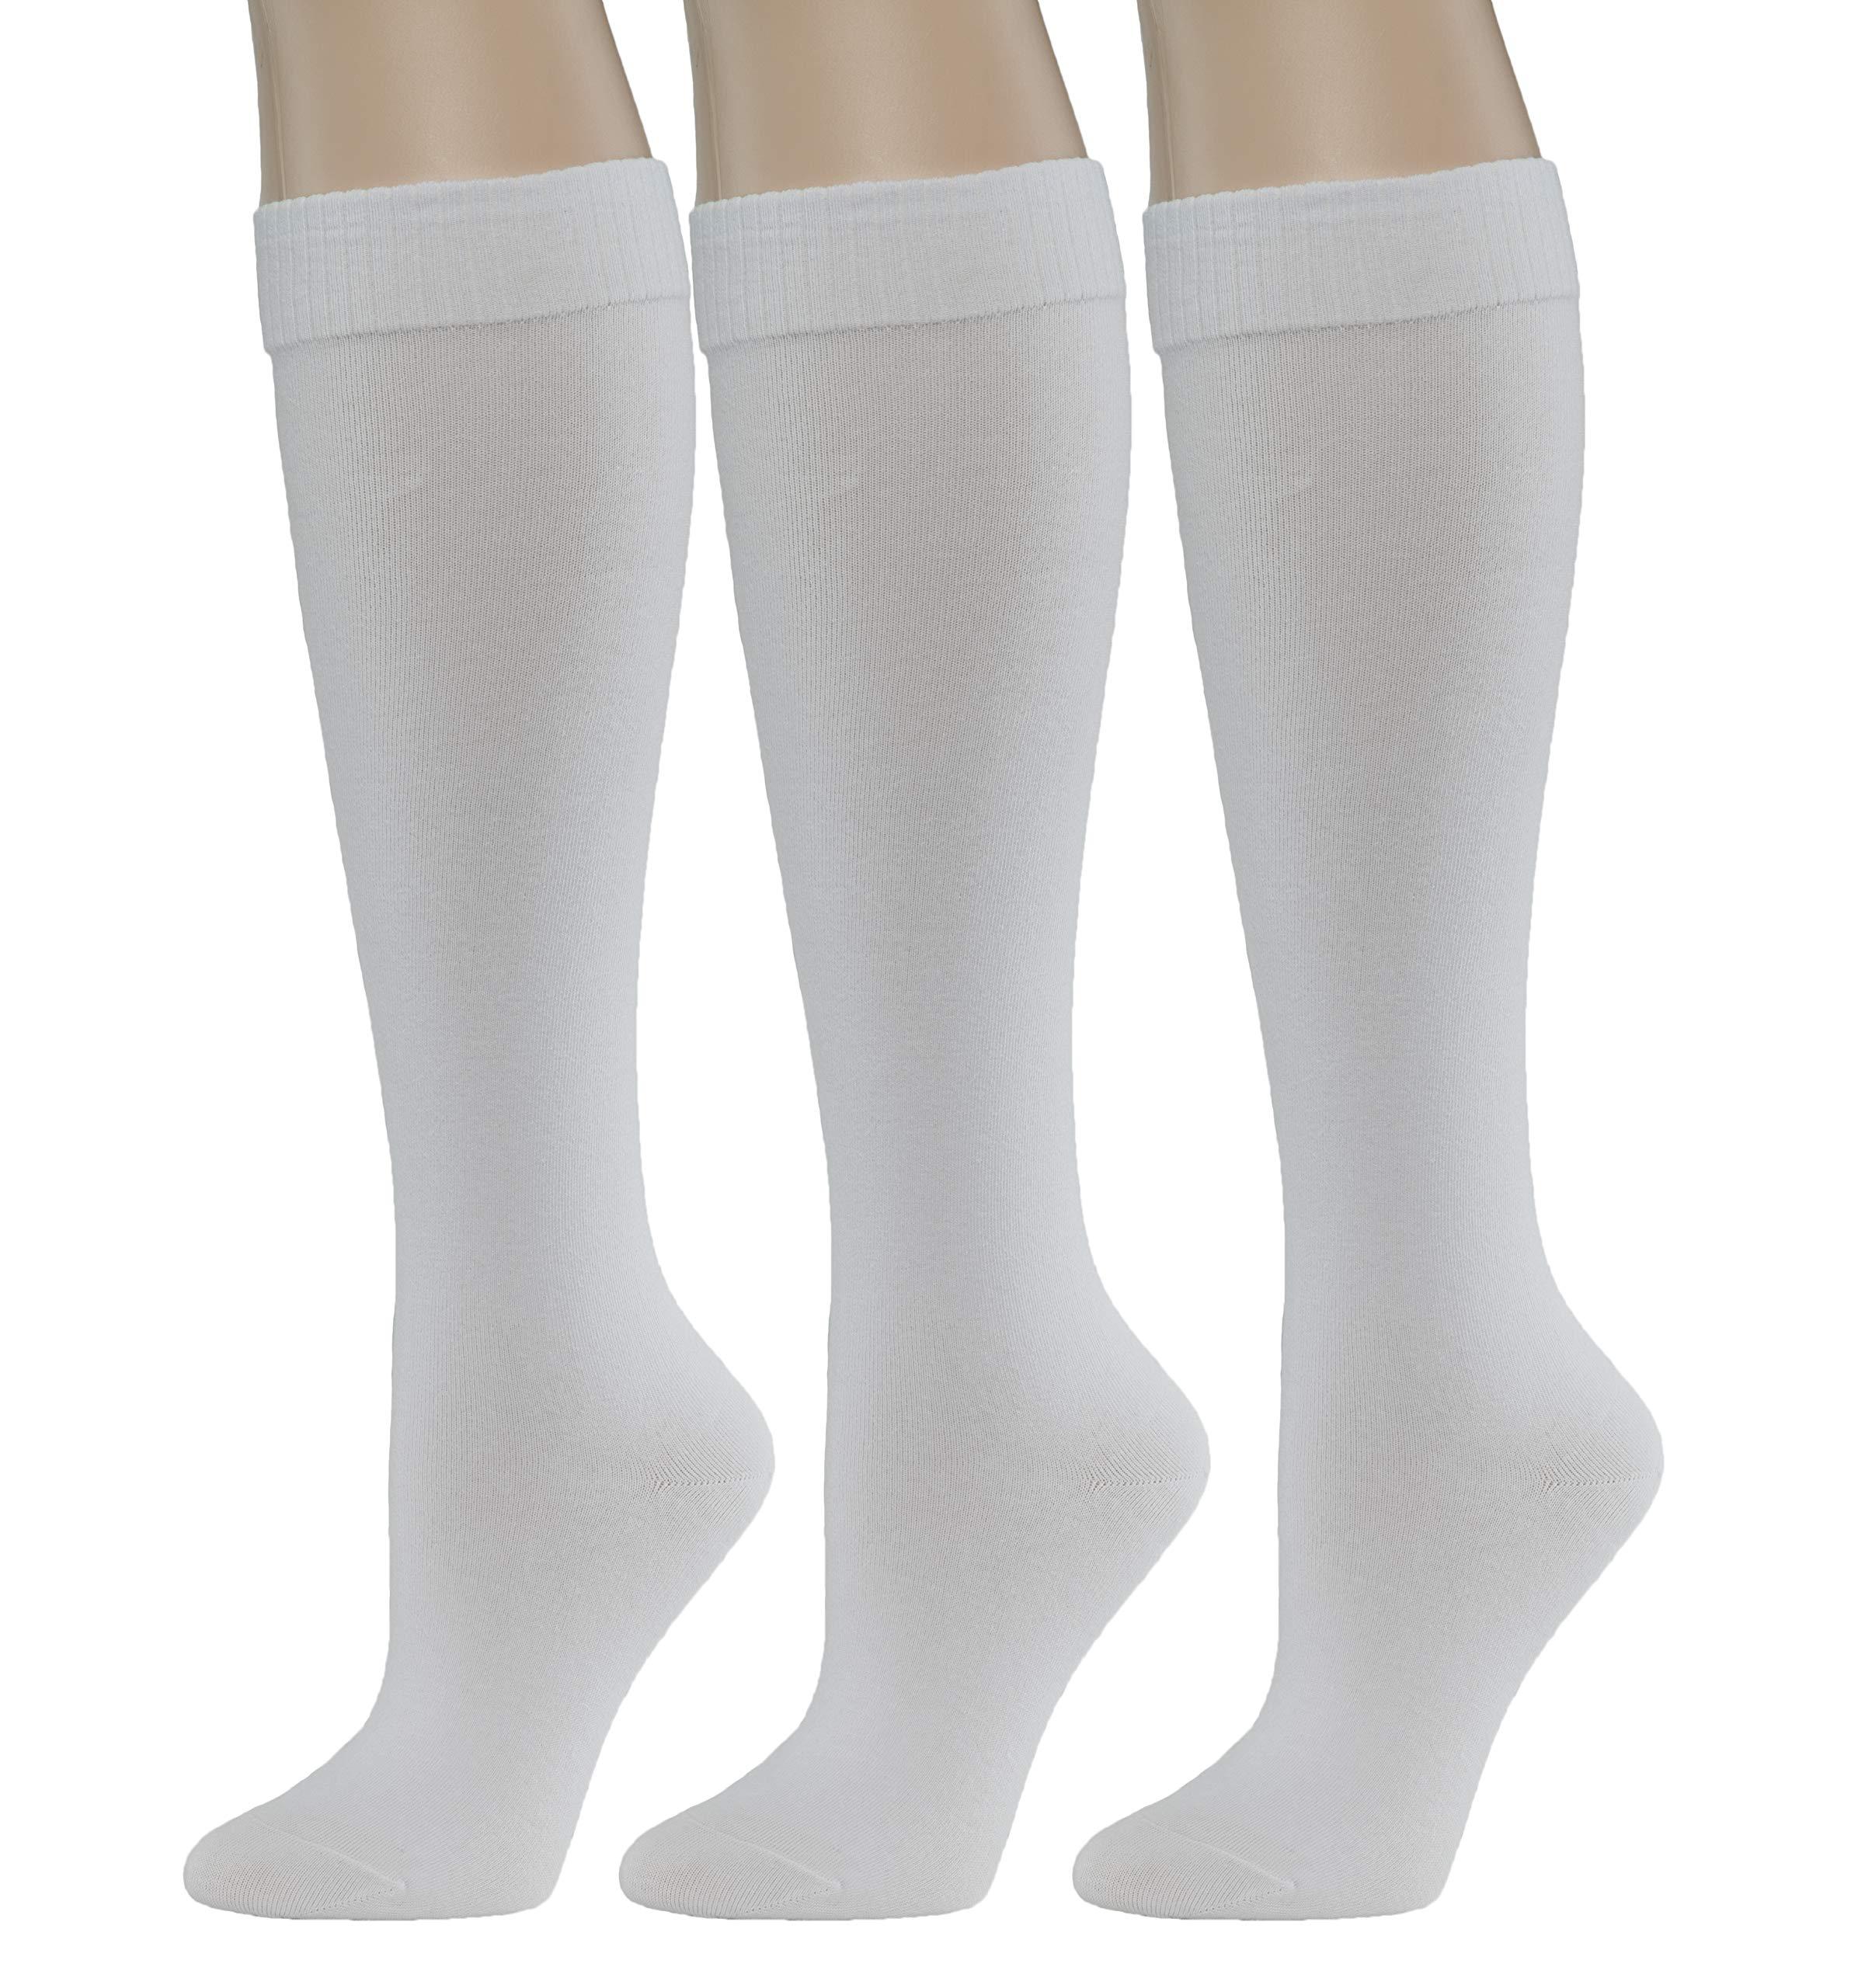 45b5d7f6b6e Amazon.com  Diabetic Socks Knee High